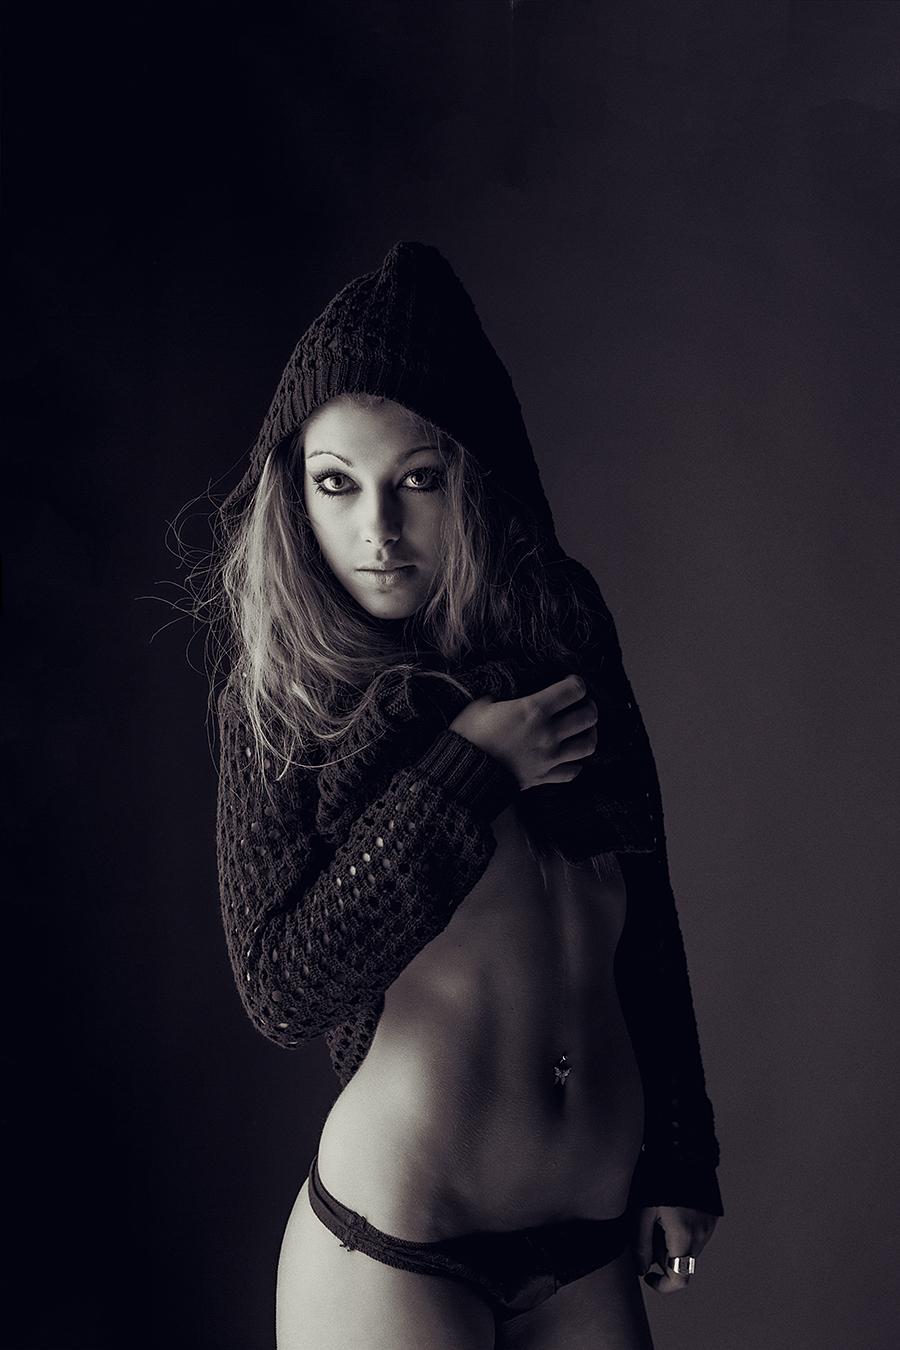 black hoodie by athrawn